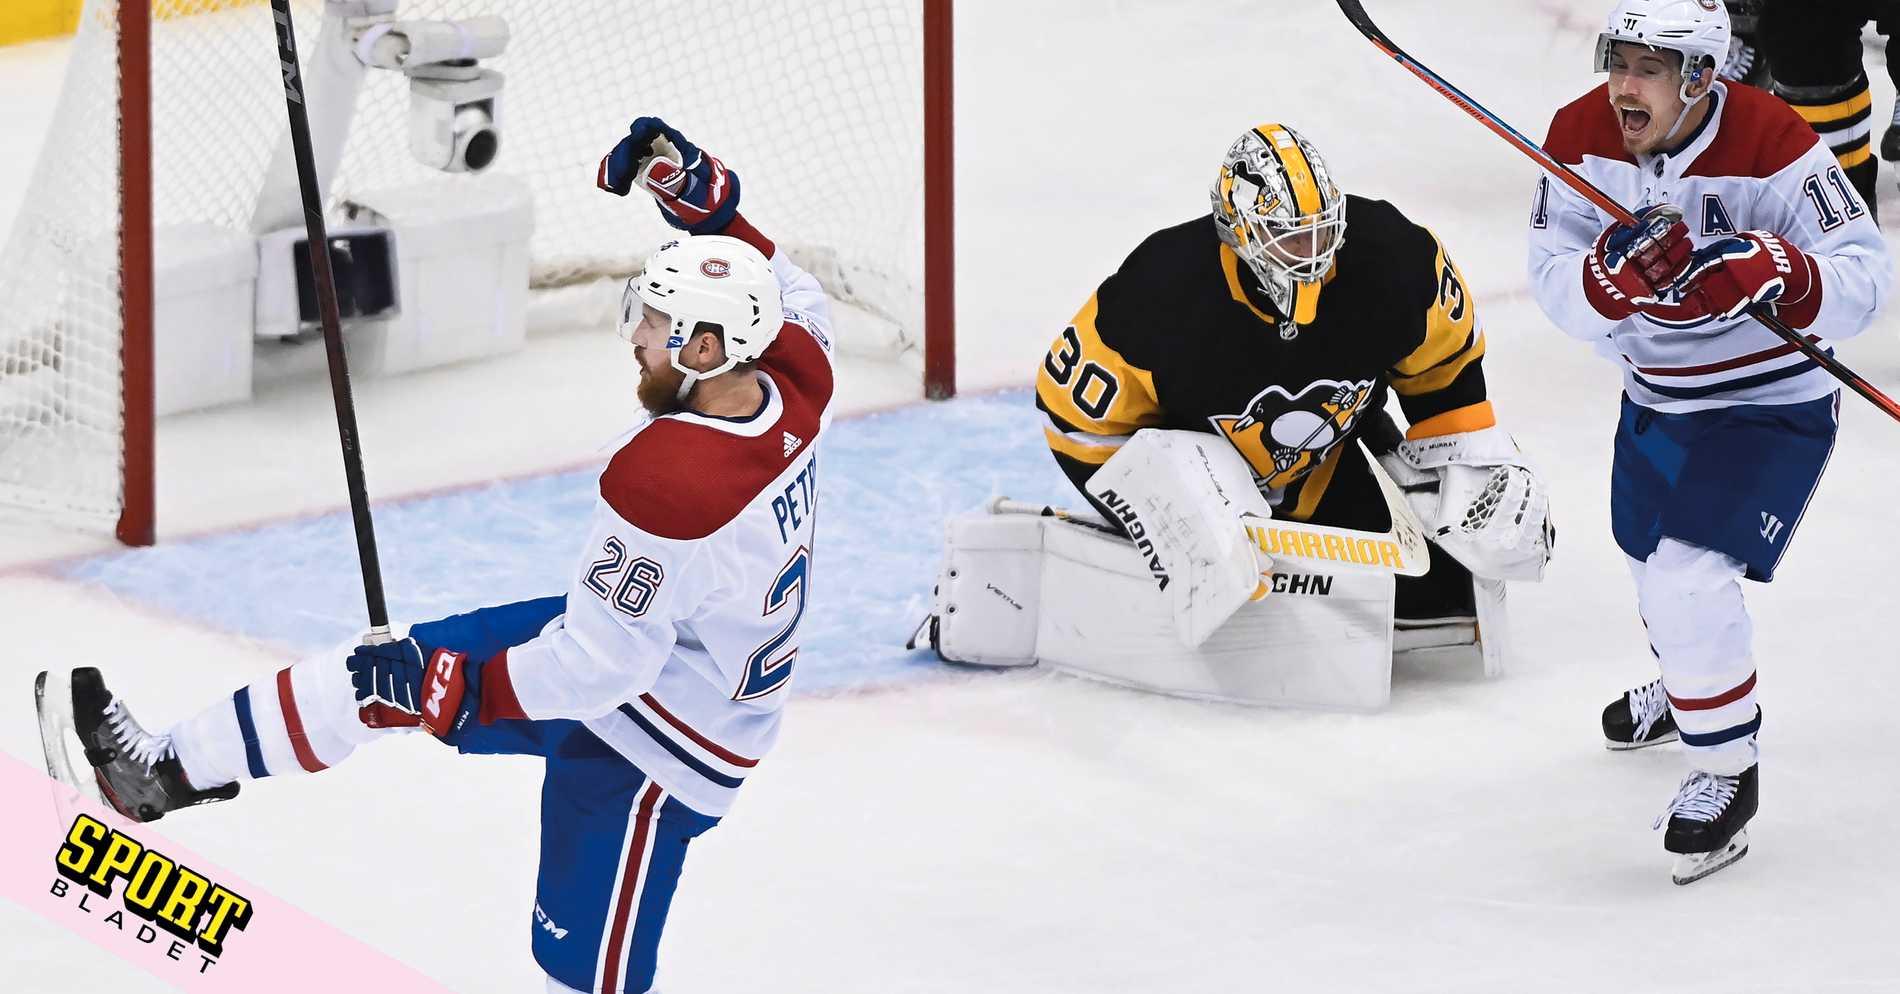 Montreal skrällde direkt mot Pittsburgh